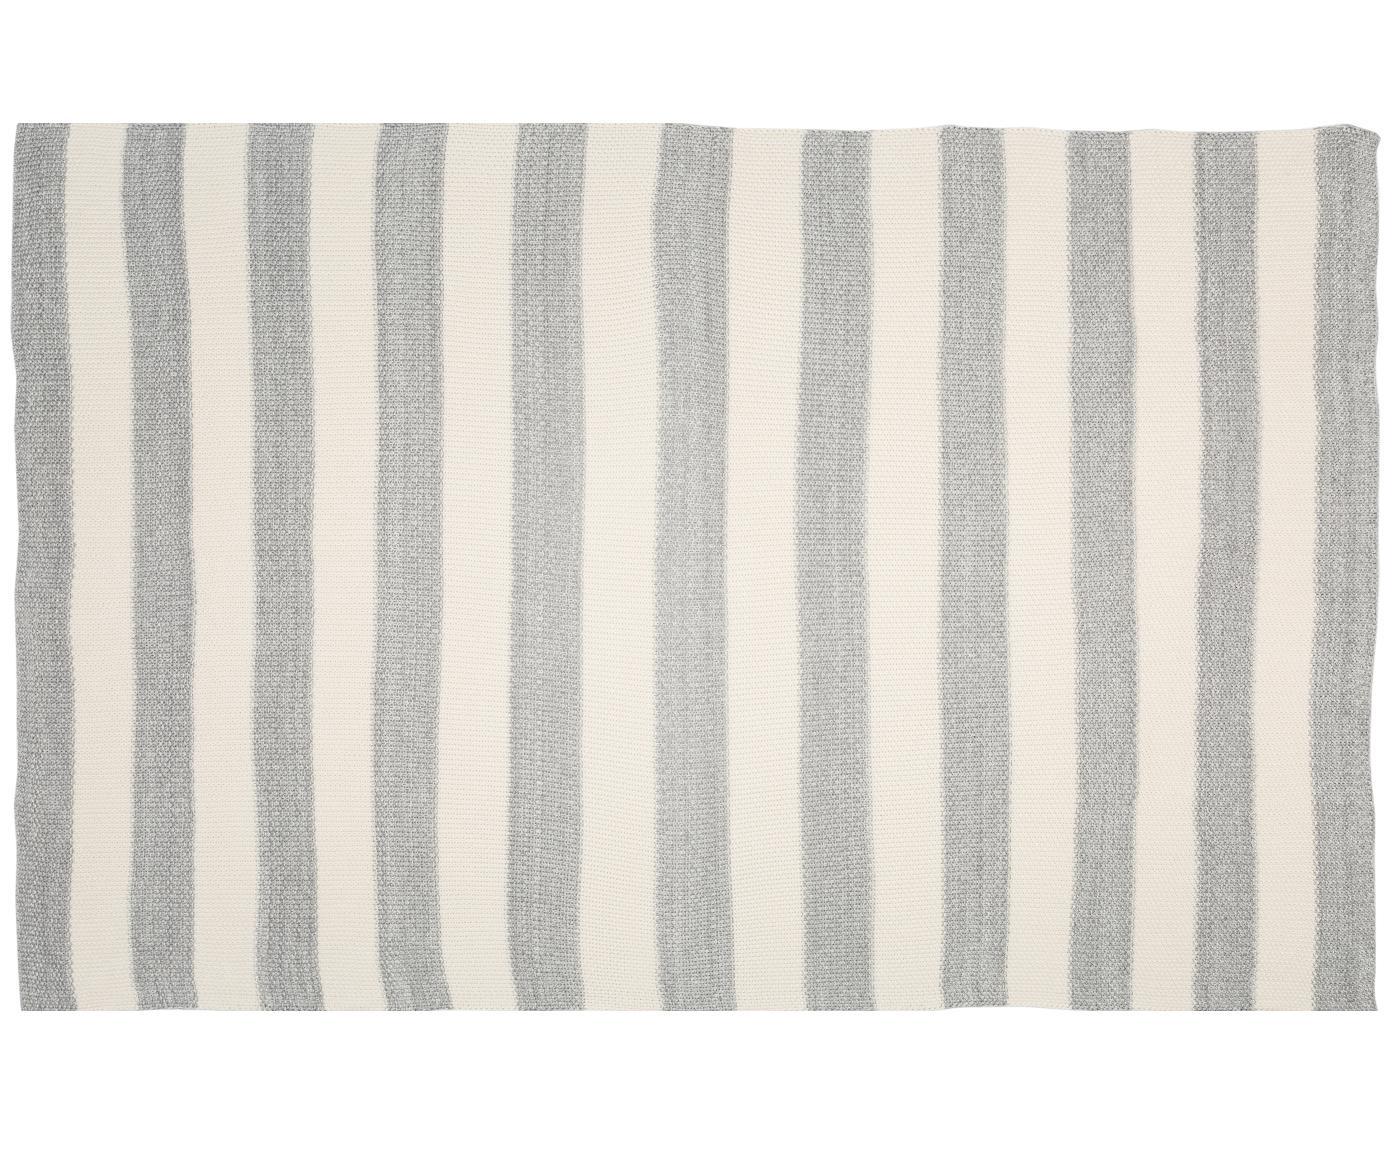 Gebreide plaid Halma, 100% katoen, Lichtgrijs, crèmewit, gevlekt, 150 x 200 cm